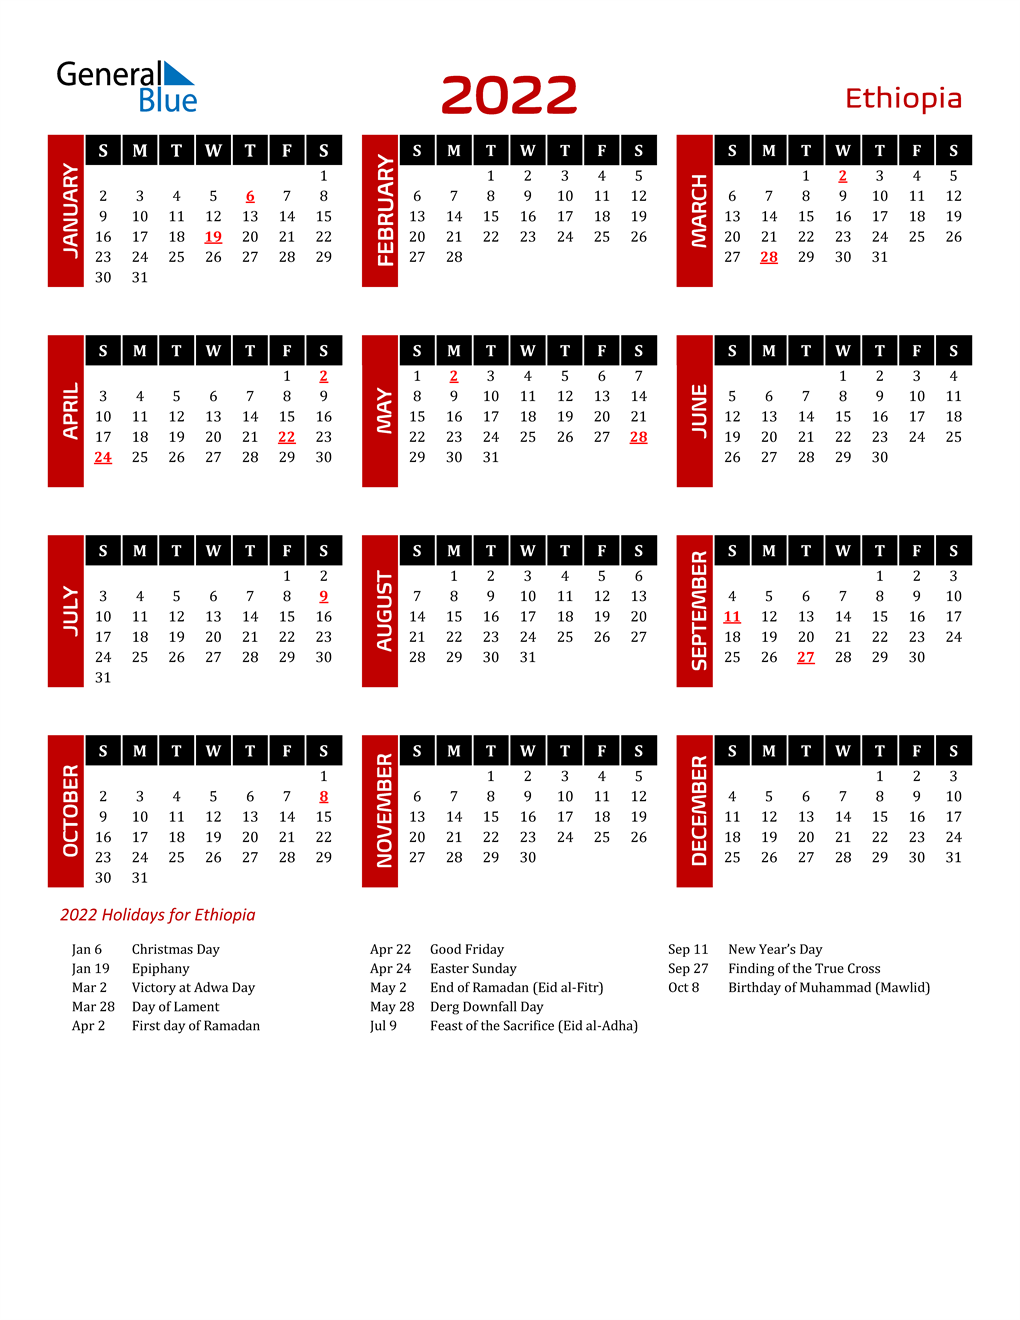 2022 Ethiopia Calendar With Holidays